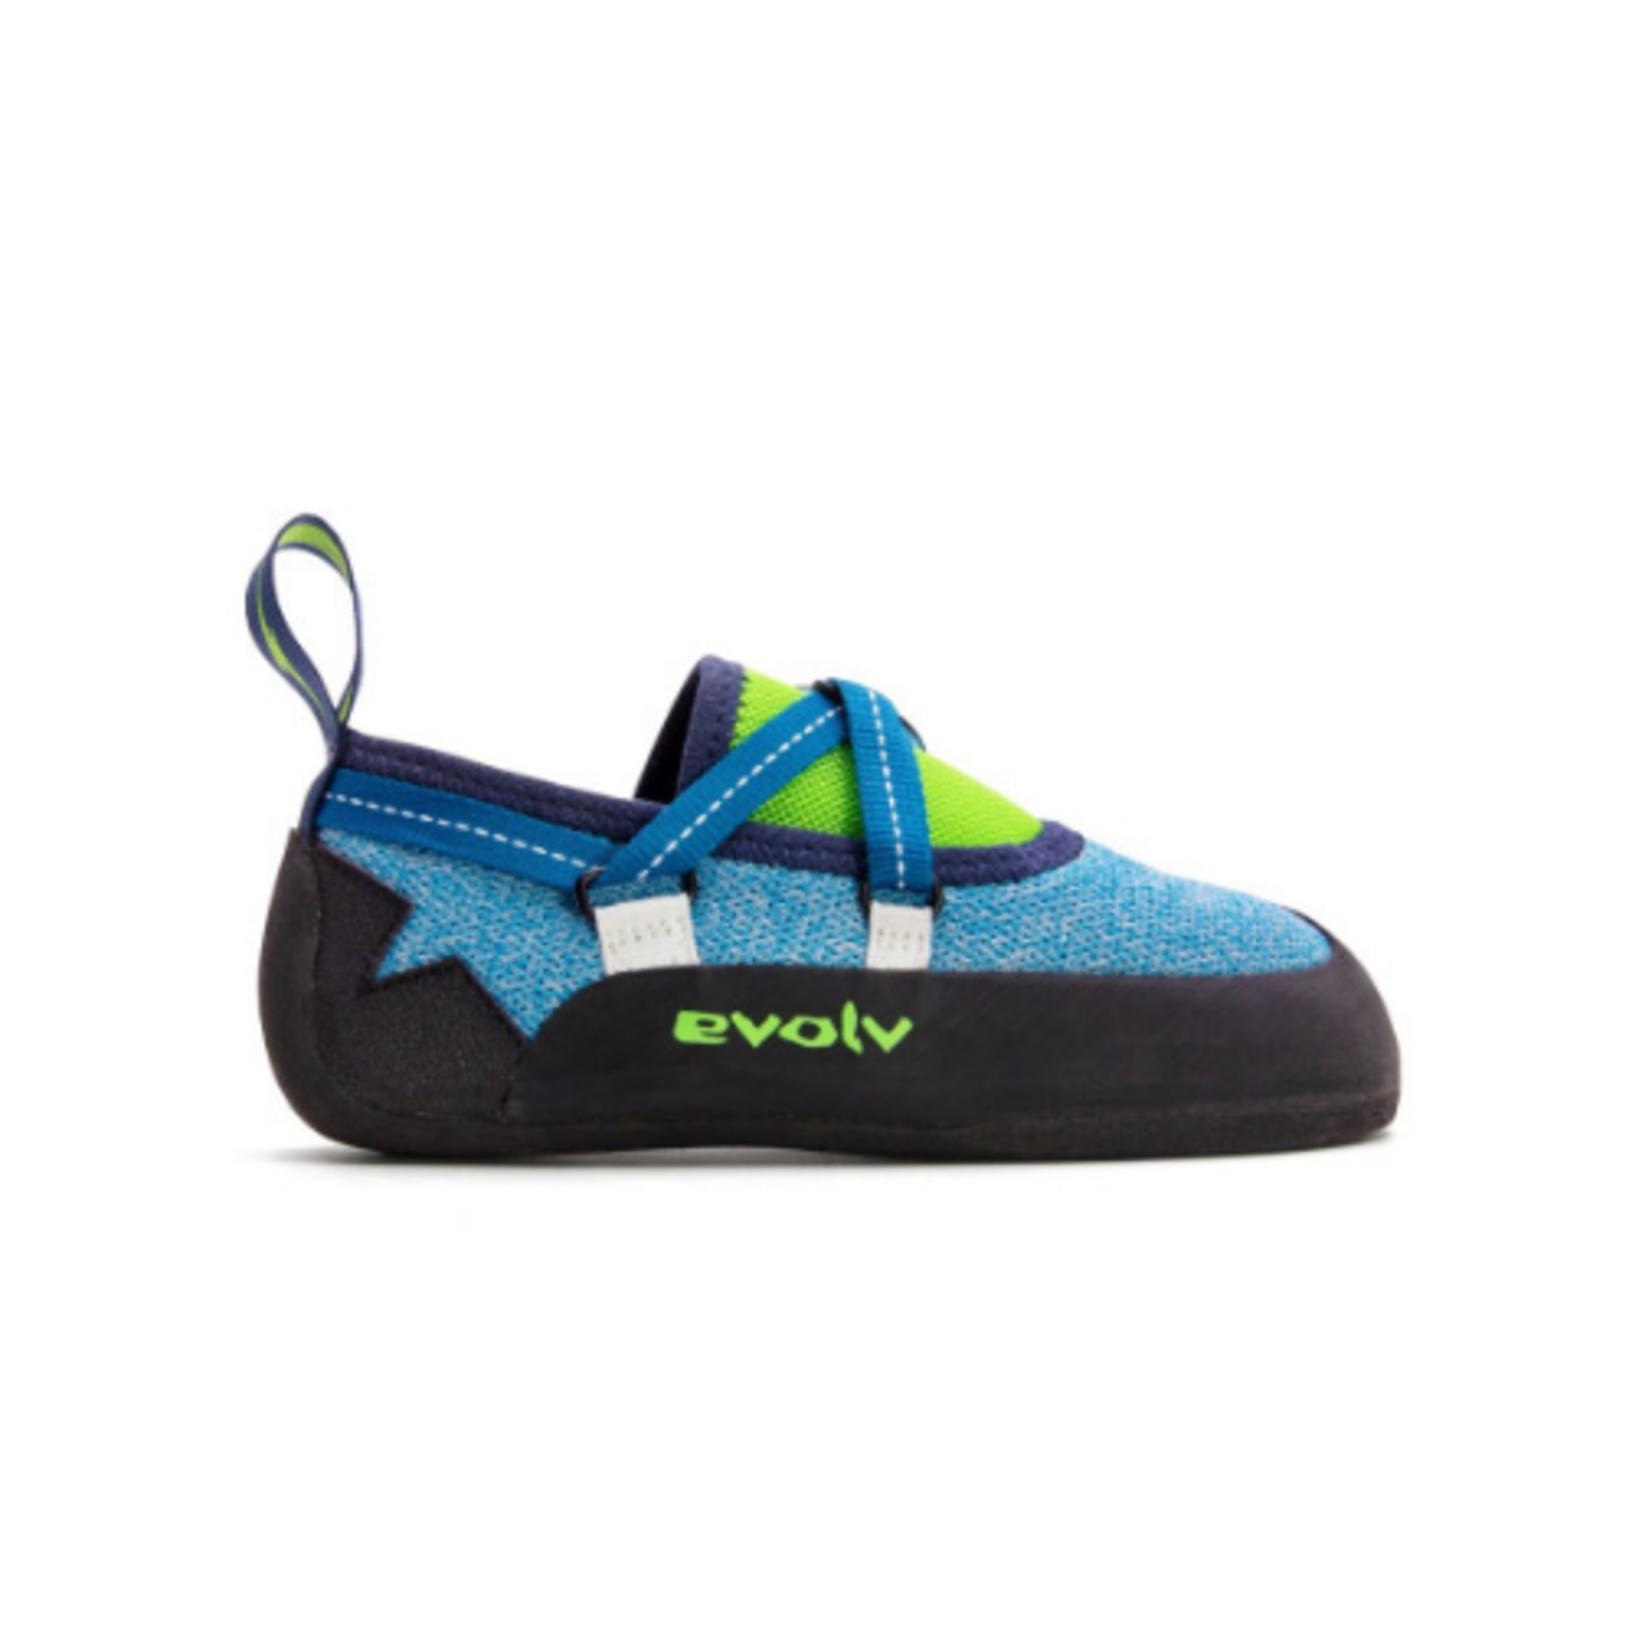 Evolv Venga Youth Climbing Shoe